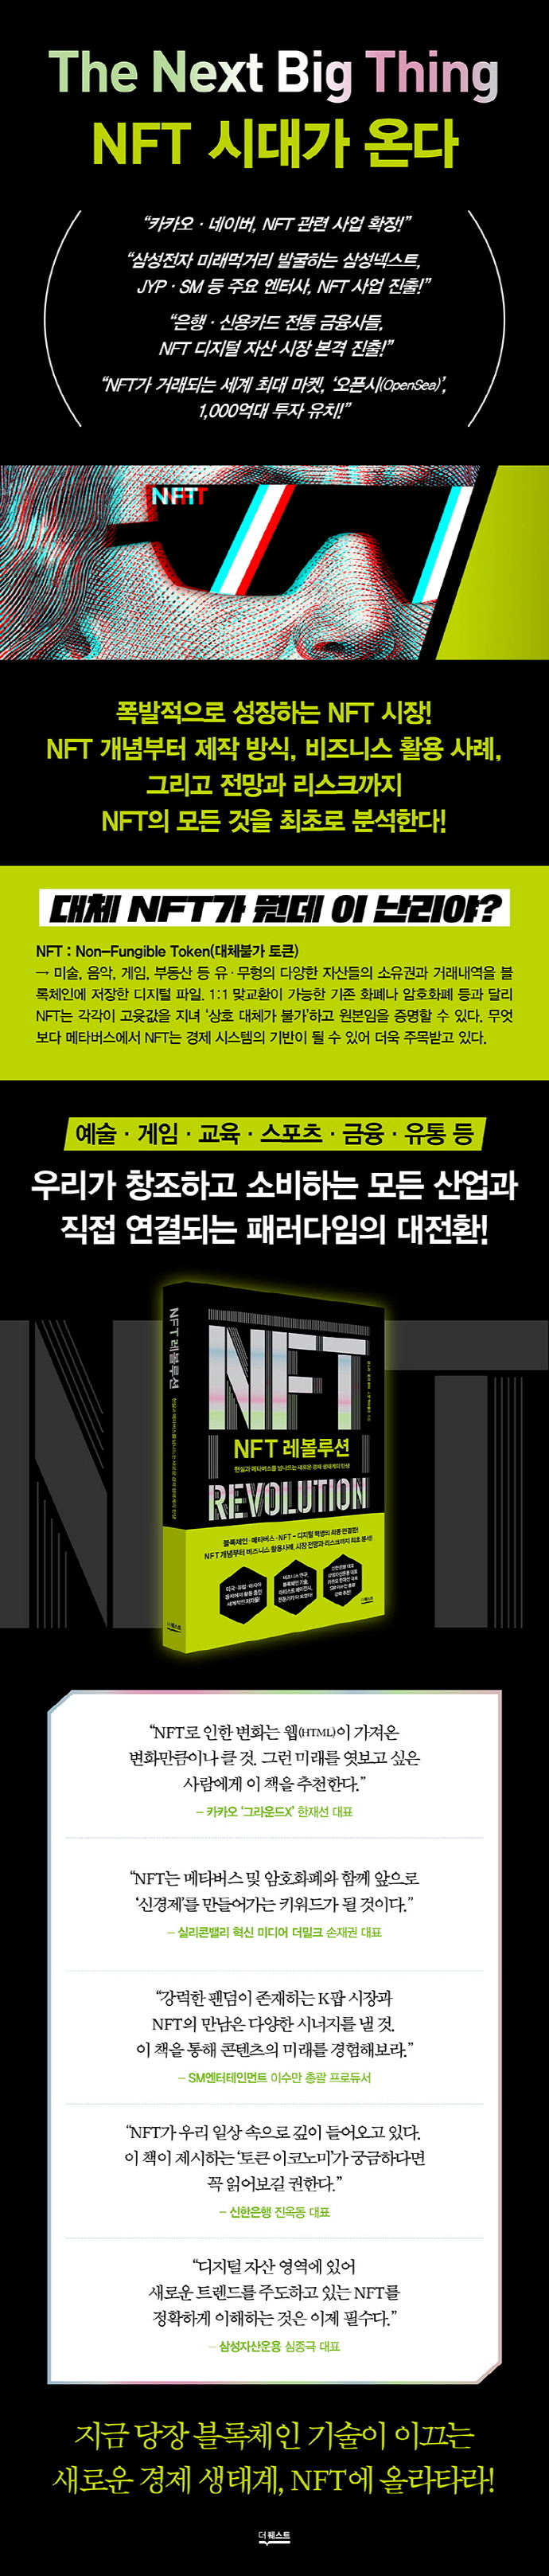 NFT 레볼루션 도서 상세이미지